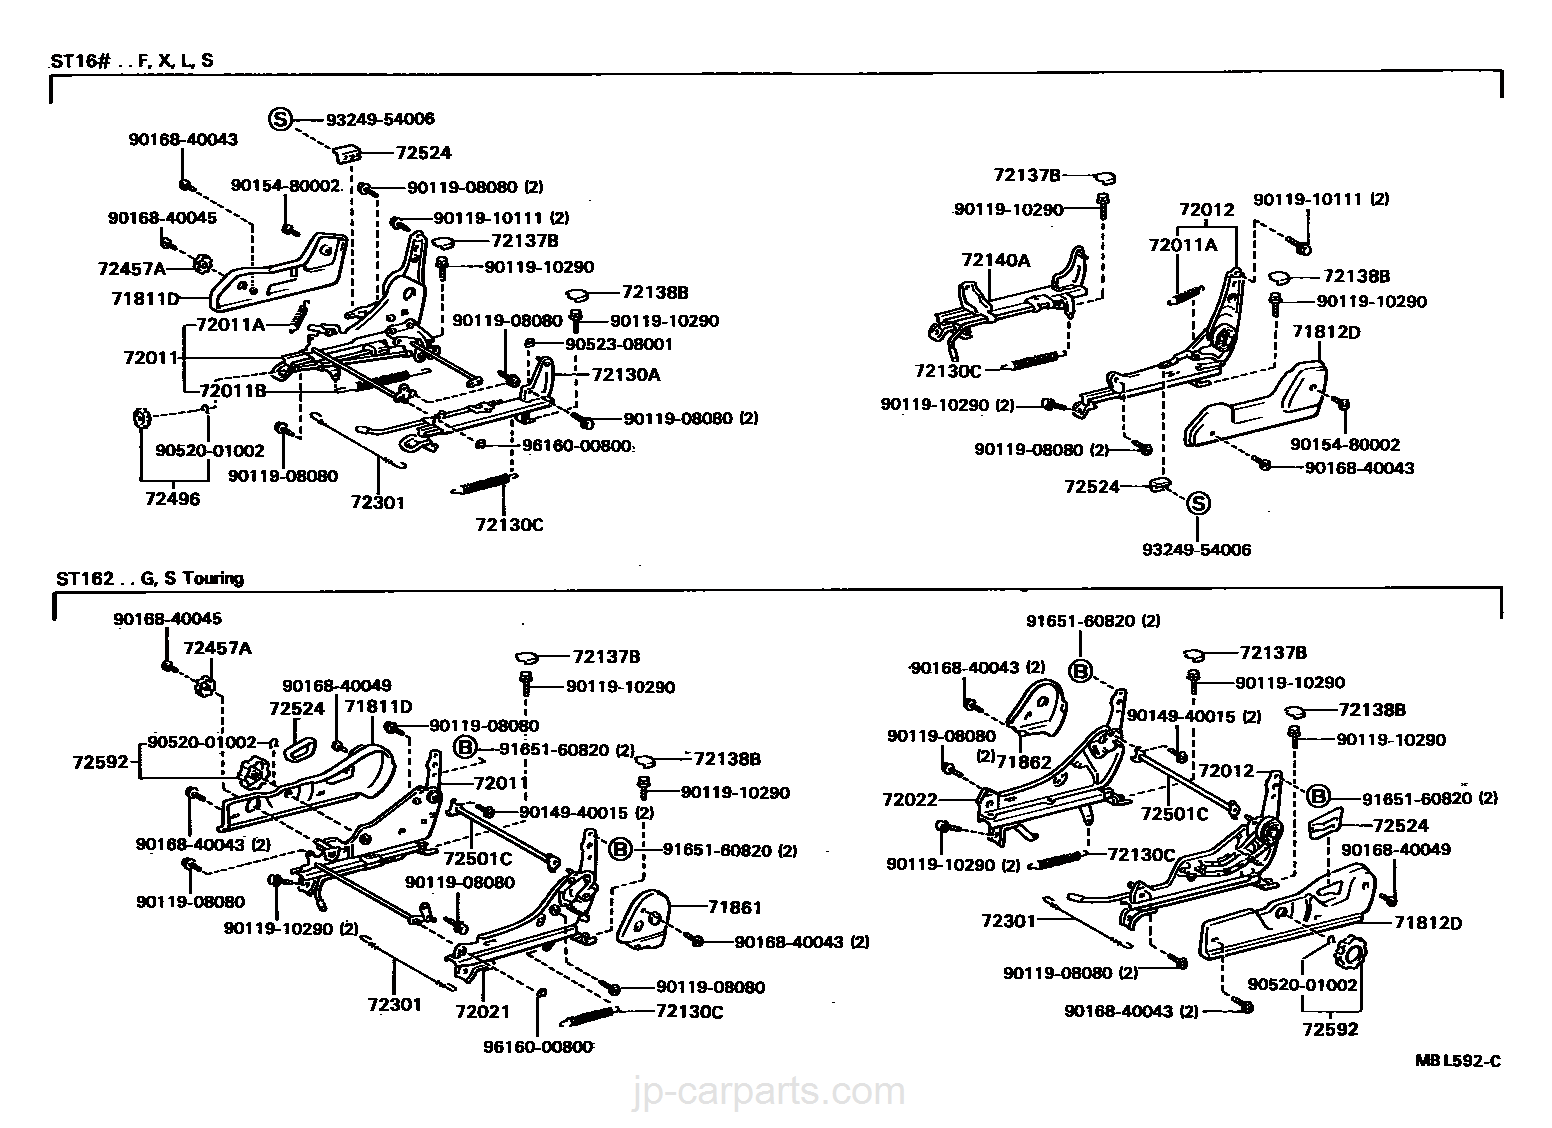 1997 Audi A6 Wagon Brown Driver Passenger /& Rear GGBAILEY D3743A-S1A-CH-BR Custom Fit Automotive Carpet Floor Mats for 1995 1996